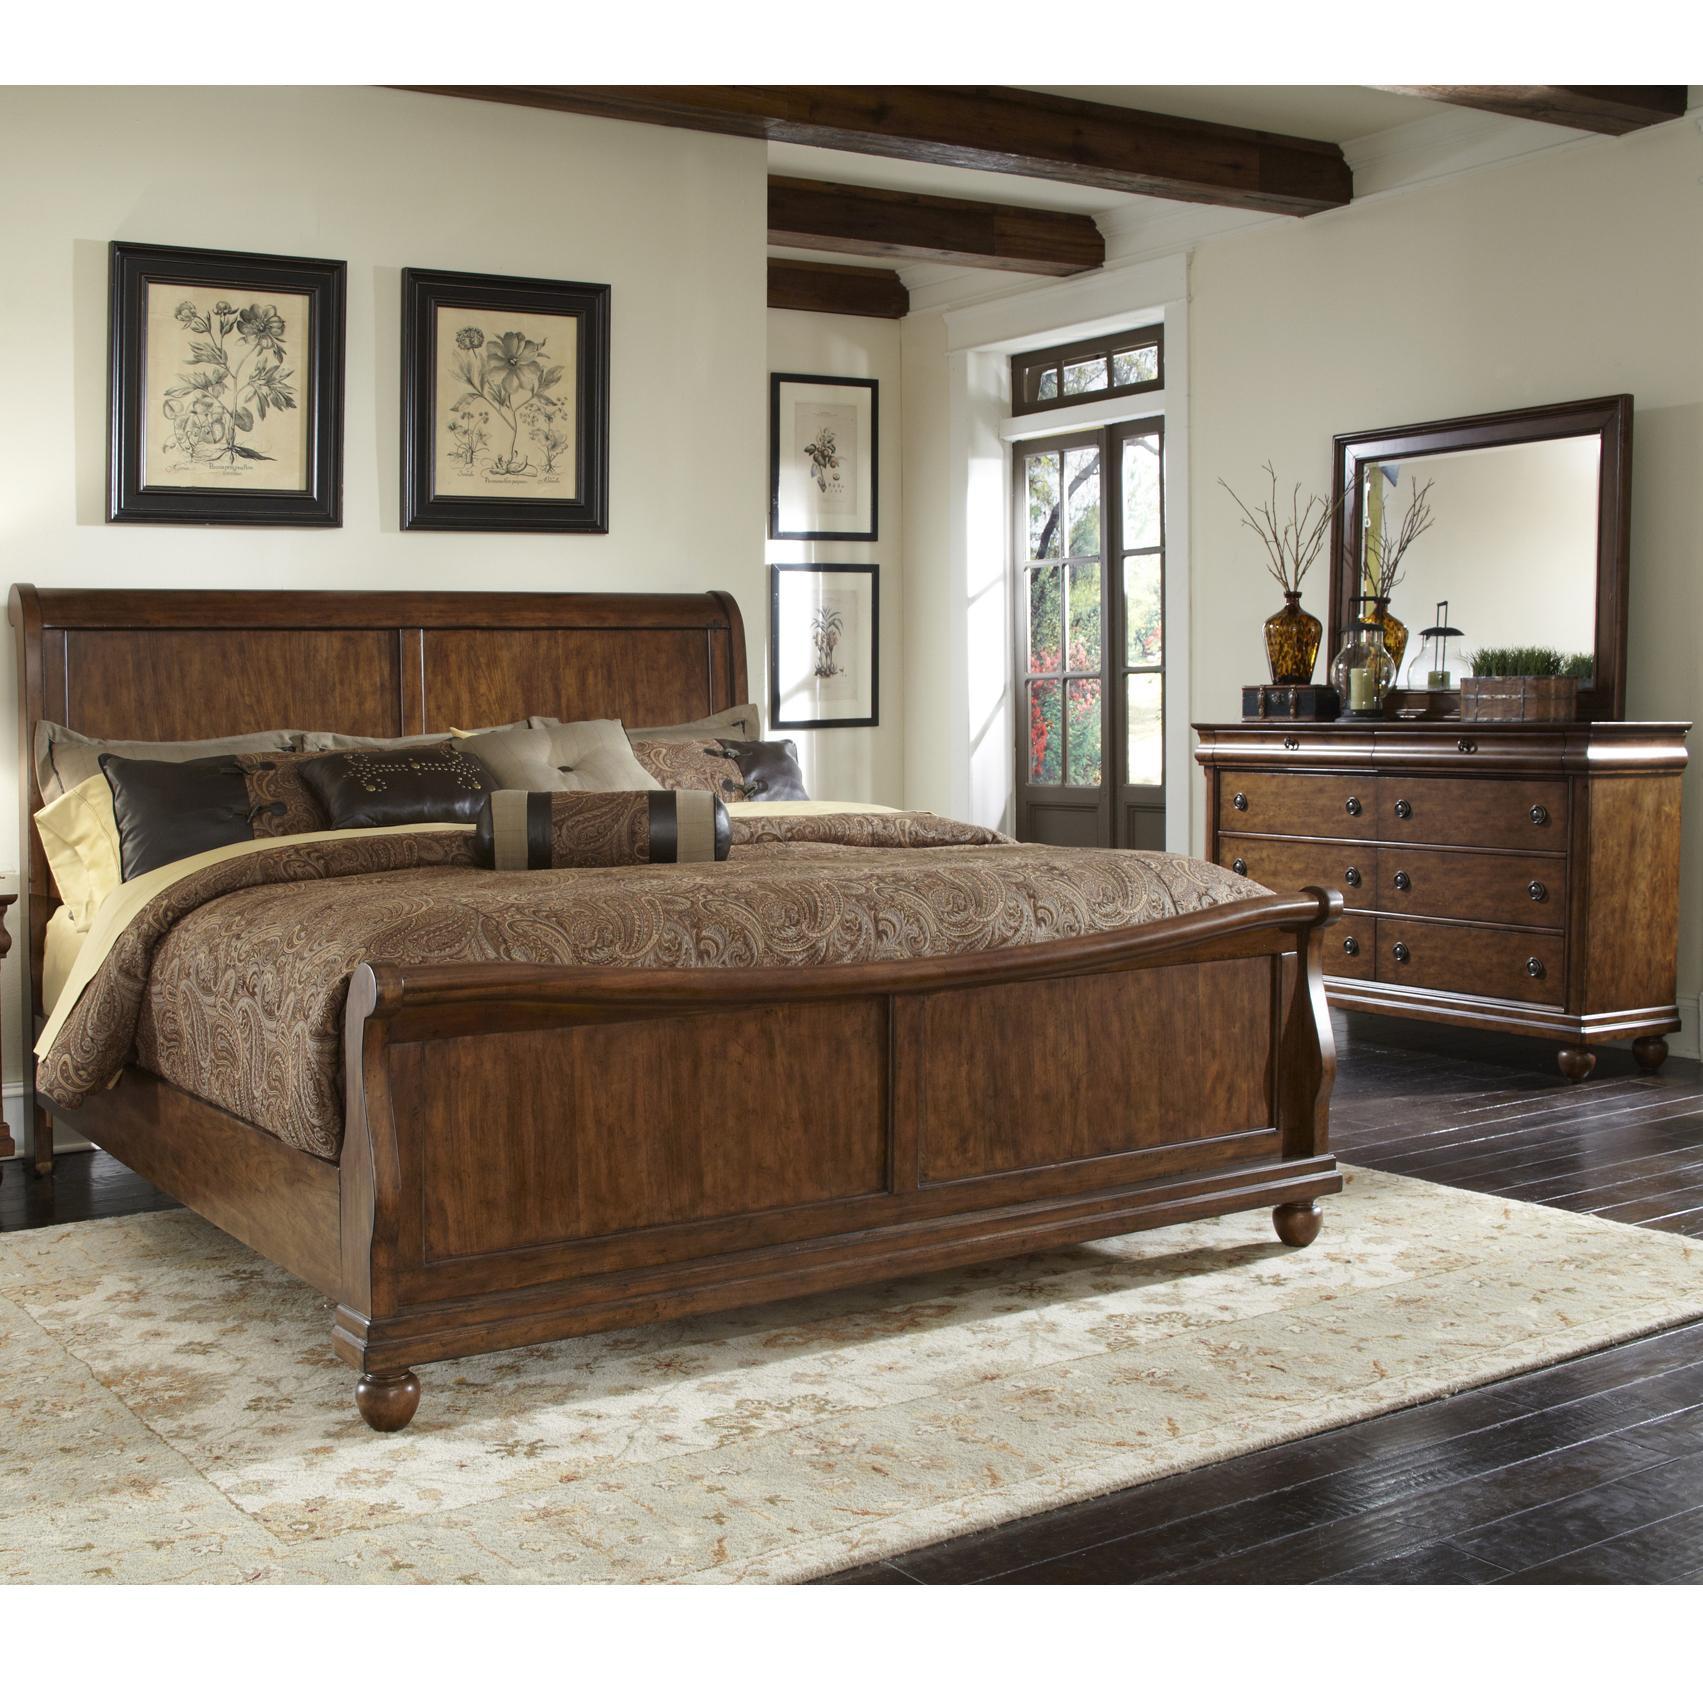 Sarah Randolph Designs Rustic Traditions Queen Bedroom Group 1